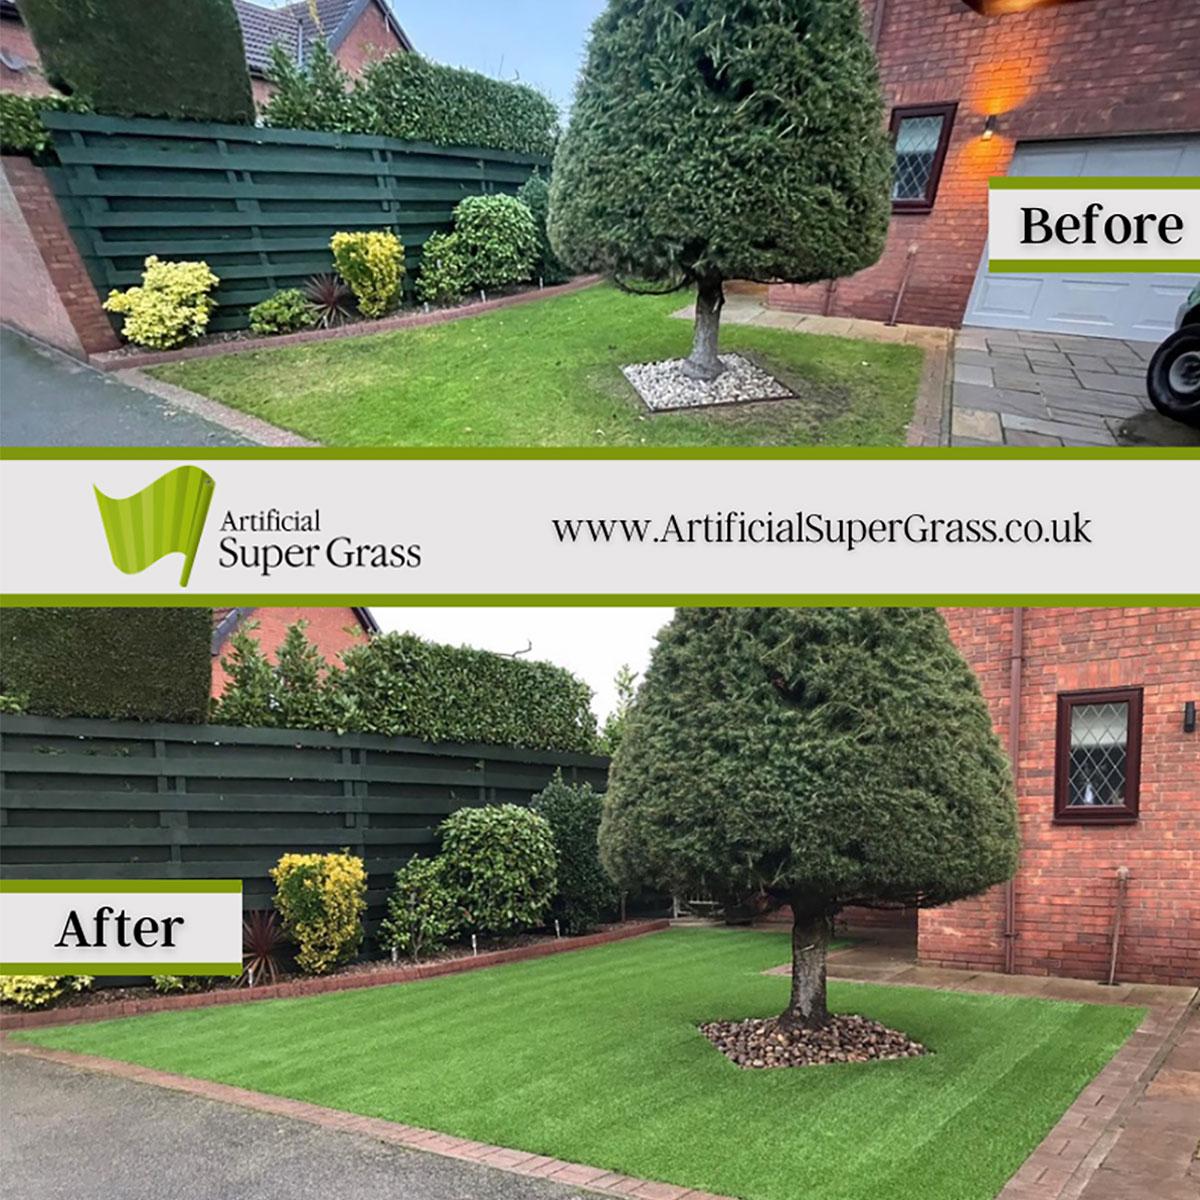 Home Artificial Super Grass